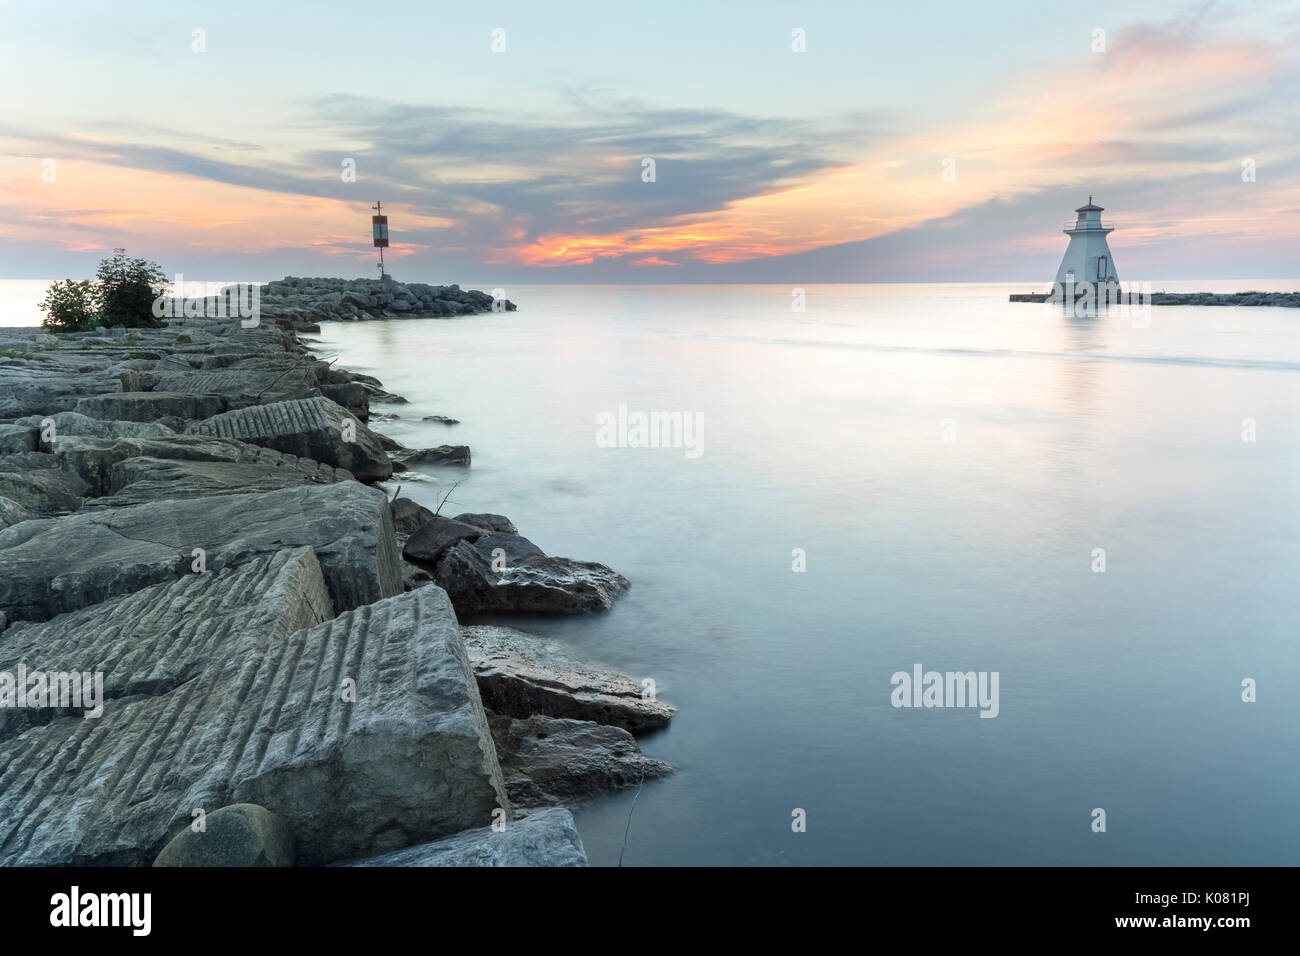 Southampton, Bruce County, Ontario, Canada - Stock Image